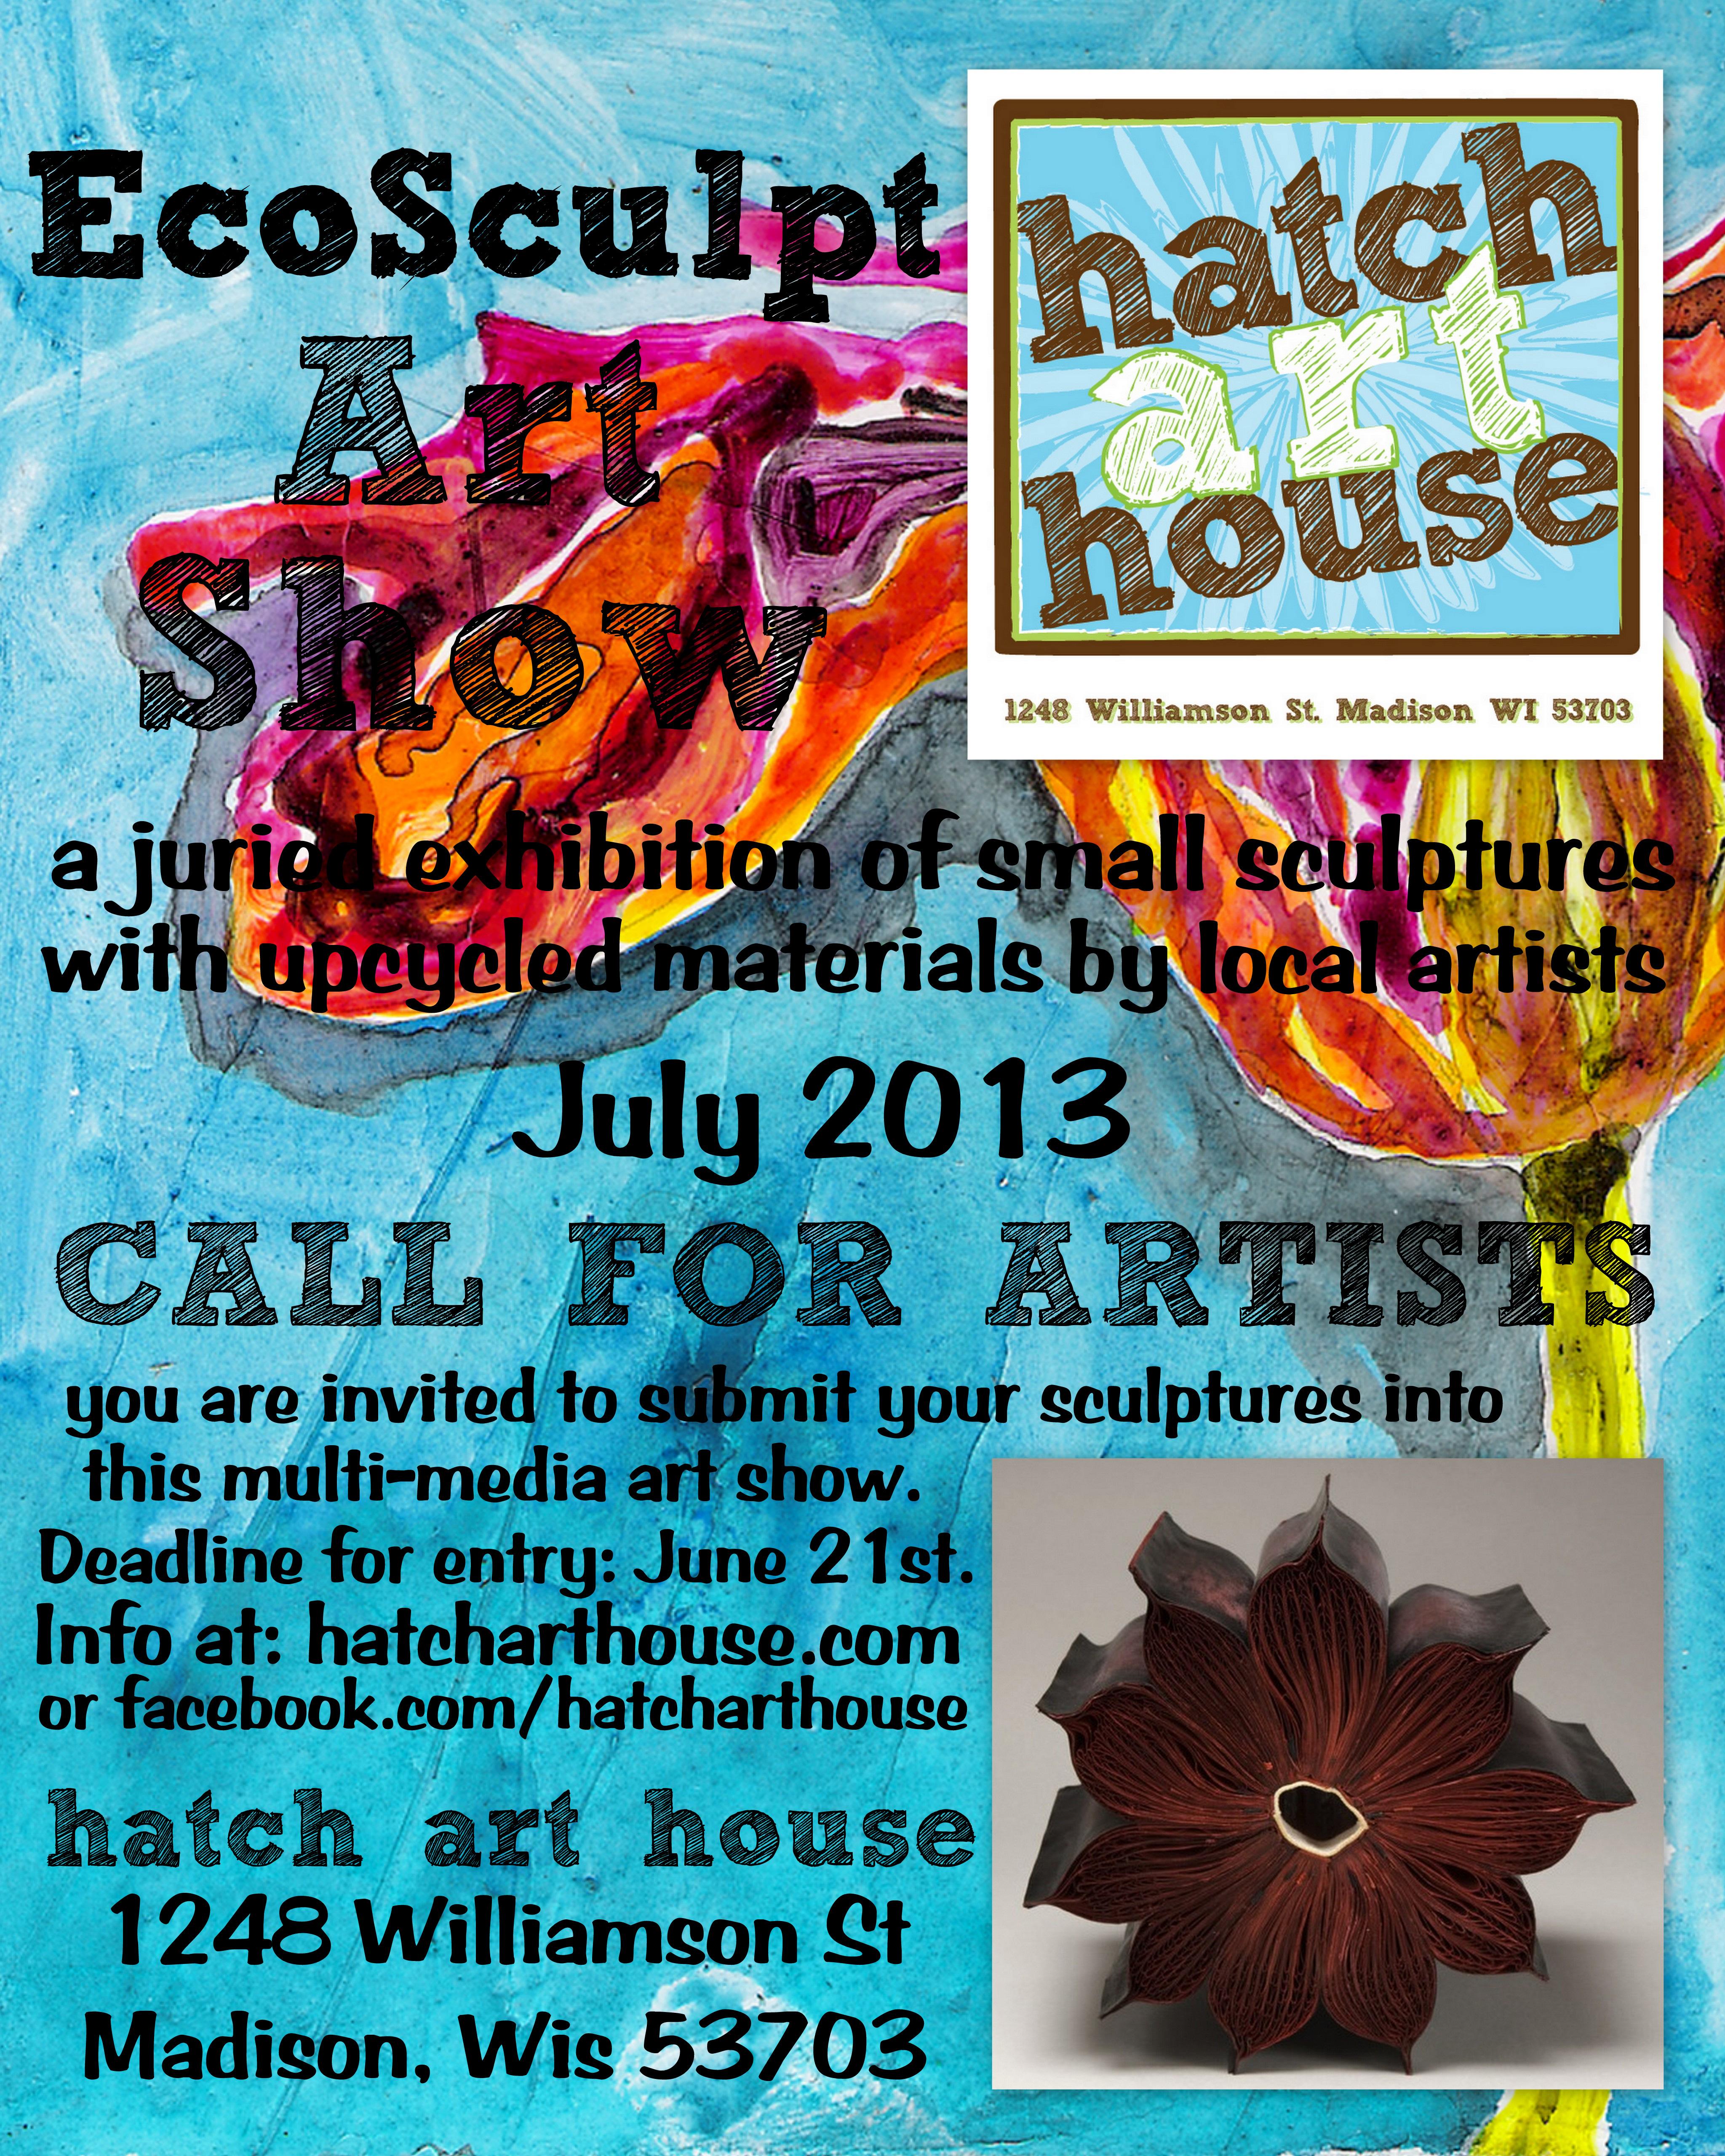 CALL FOR ARTISTS! EcoSculpt Art Show | hatcharthouse